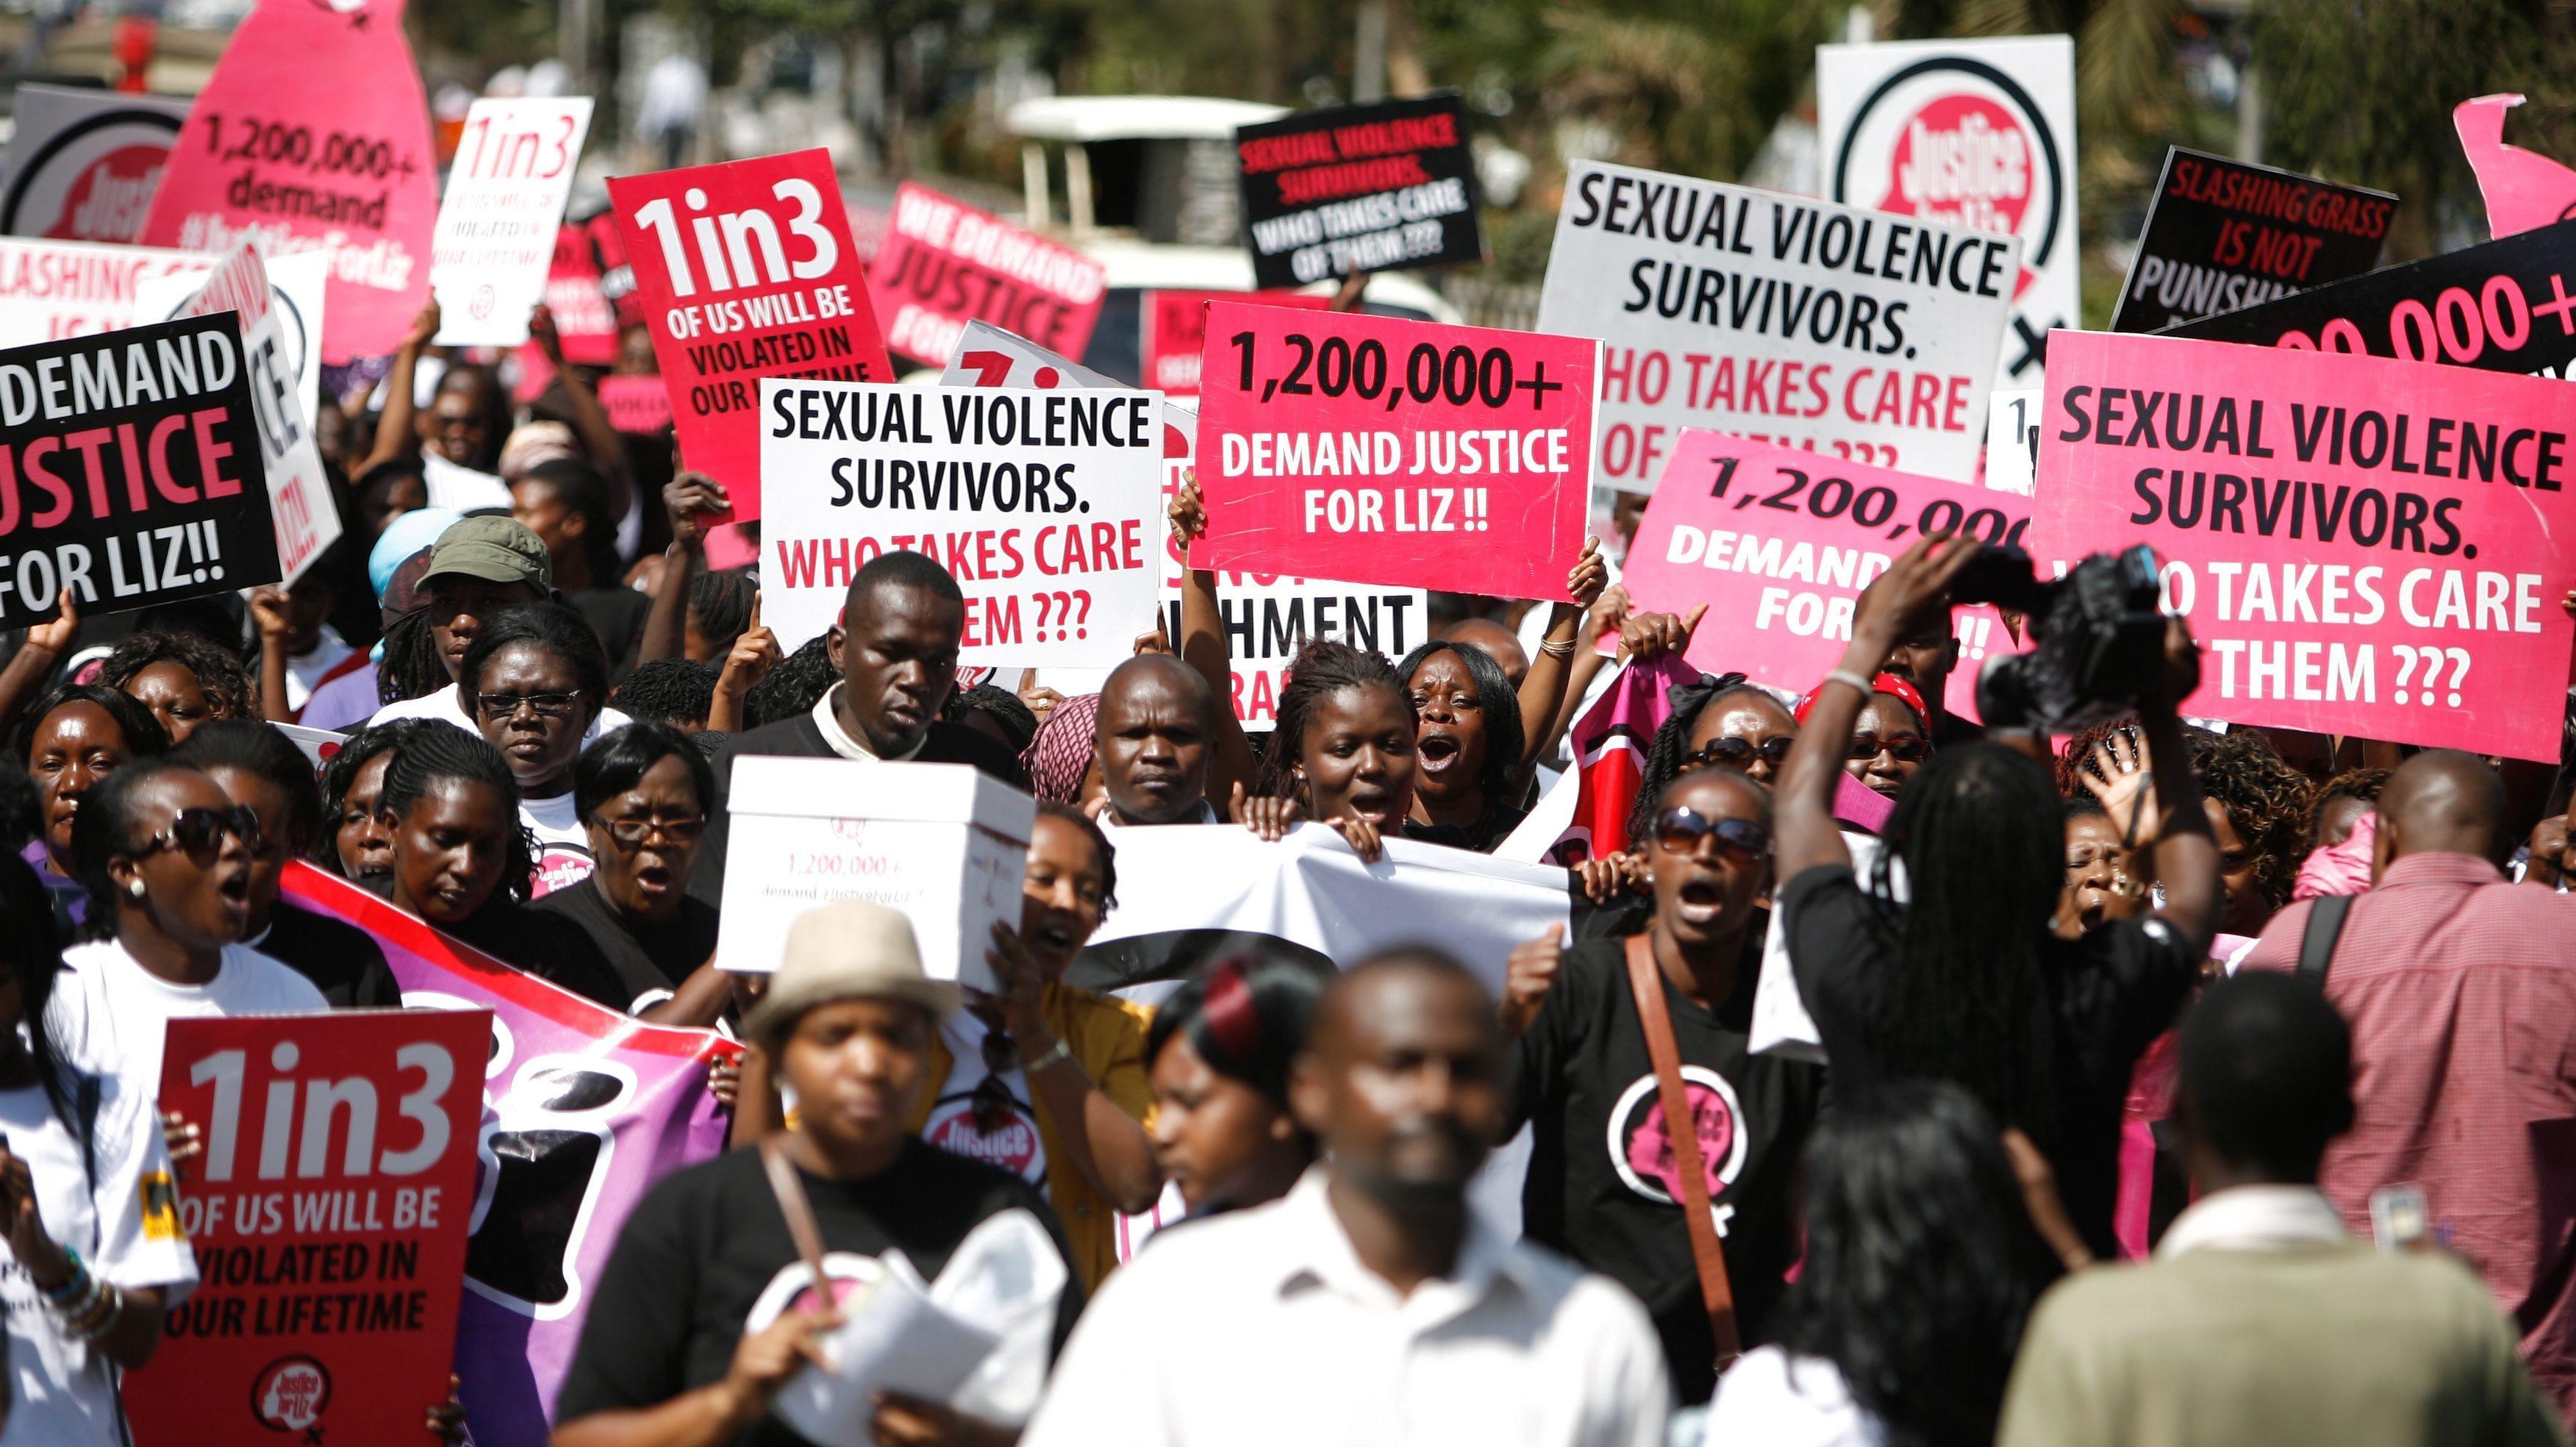 Protesters Call For Justice In Brutal Gang Rape In Kenya